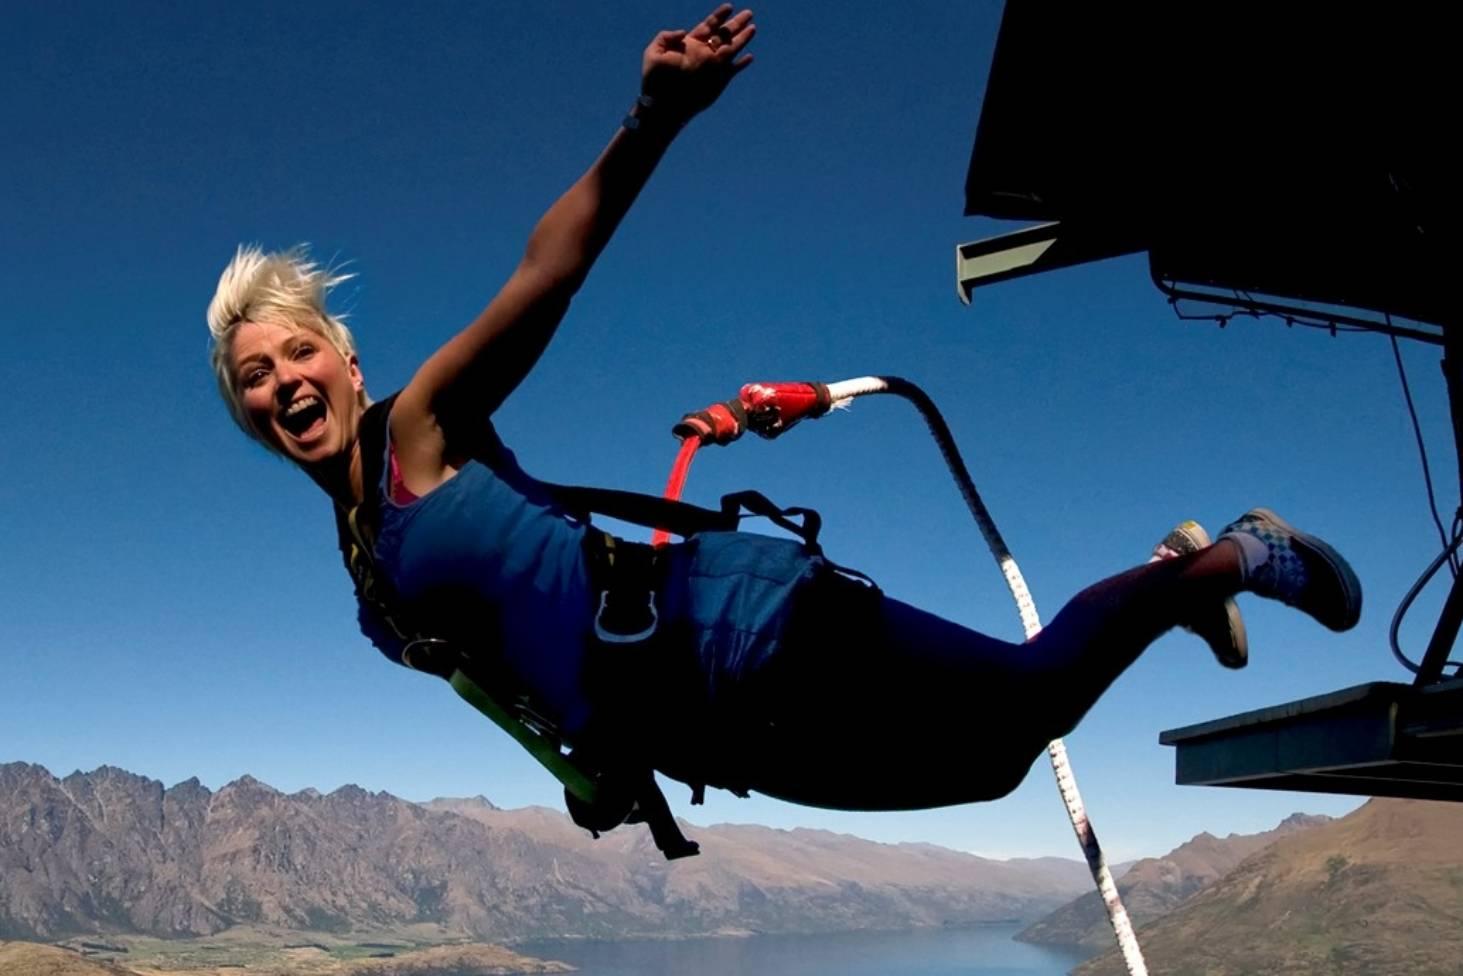 The 10 best adventure holiday destinations   Stuff co nz